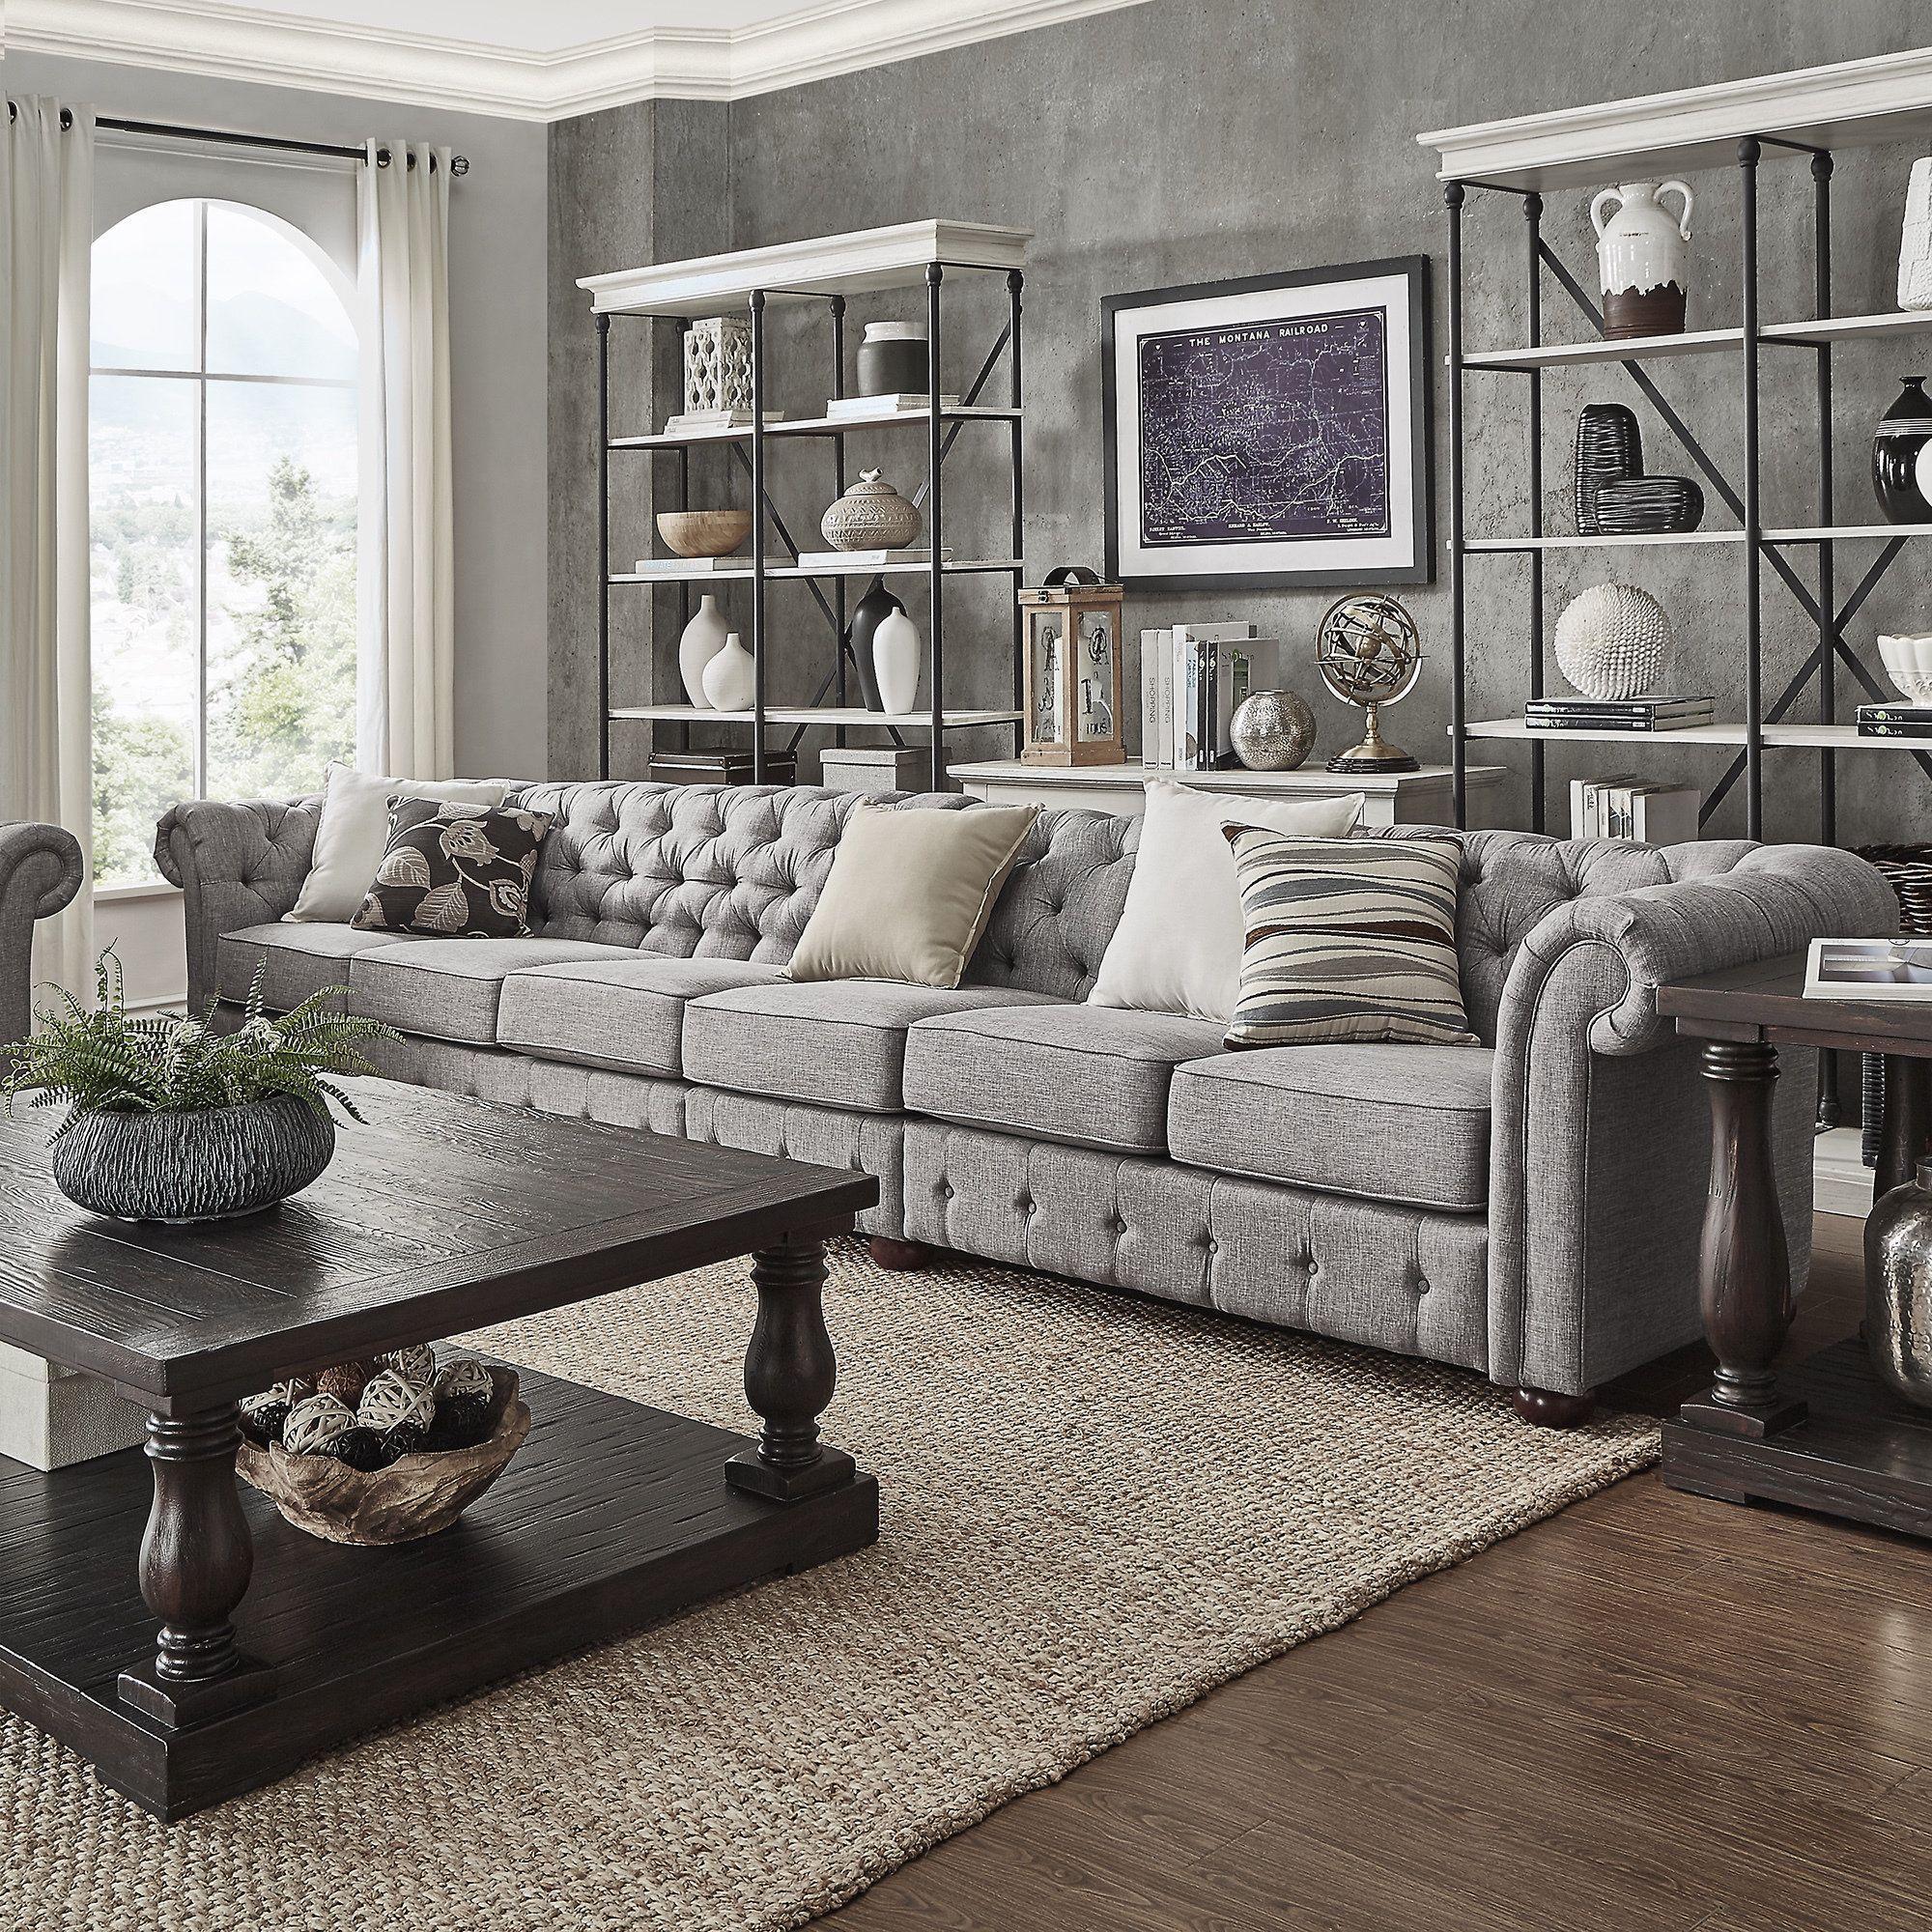 Knightsbridge Grey Linen Oversize Extra Long Tufted Chesterfield Modular  Sofa By Signal Hills (